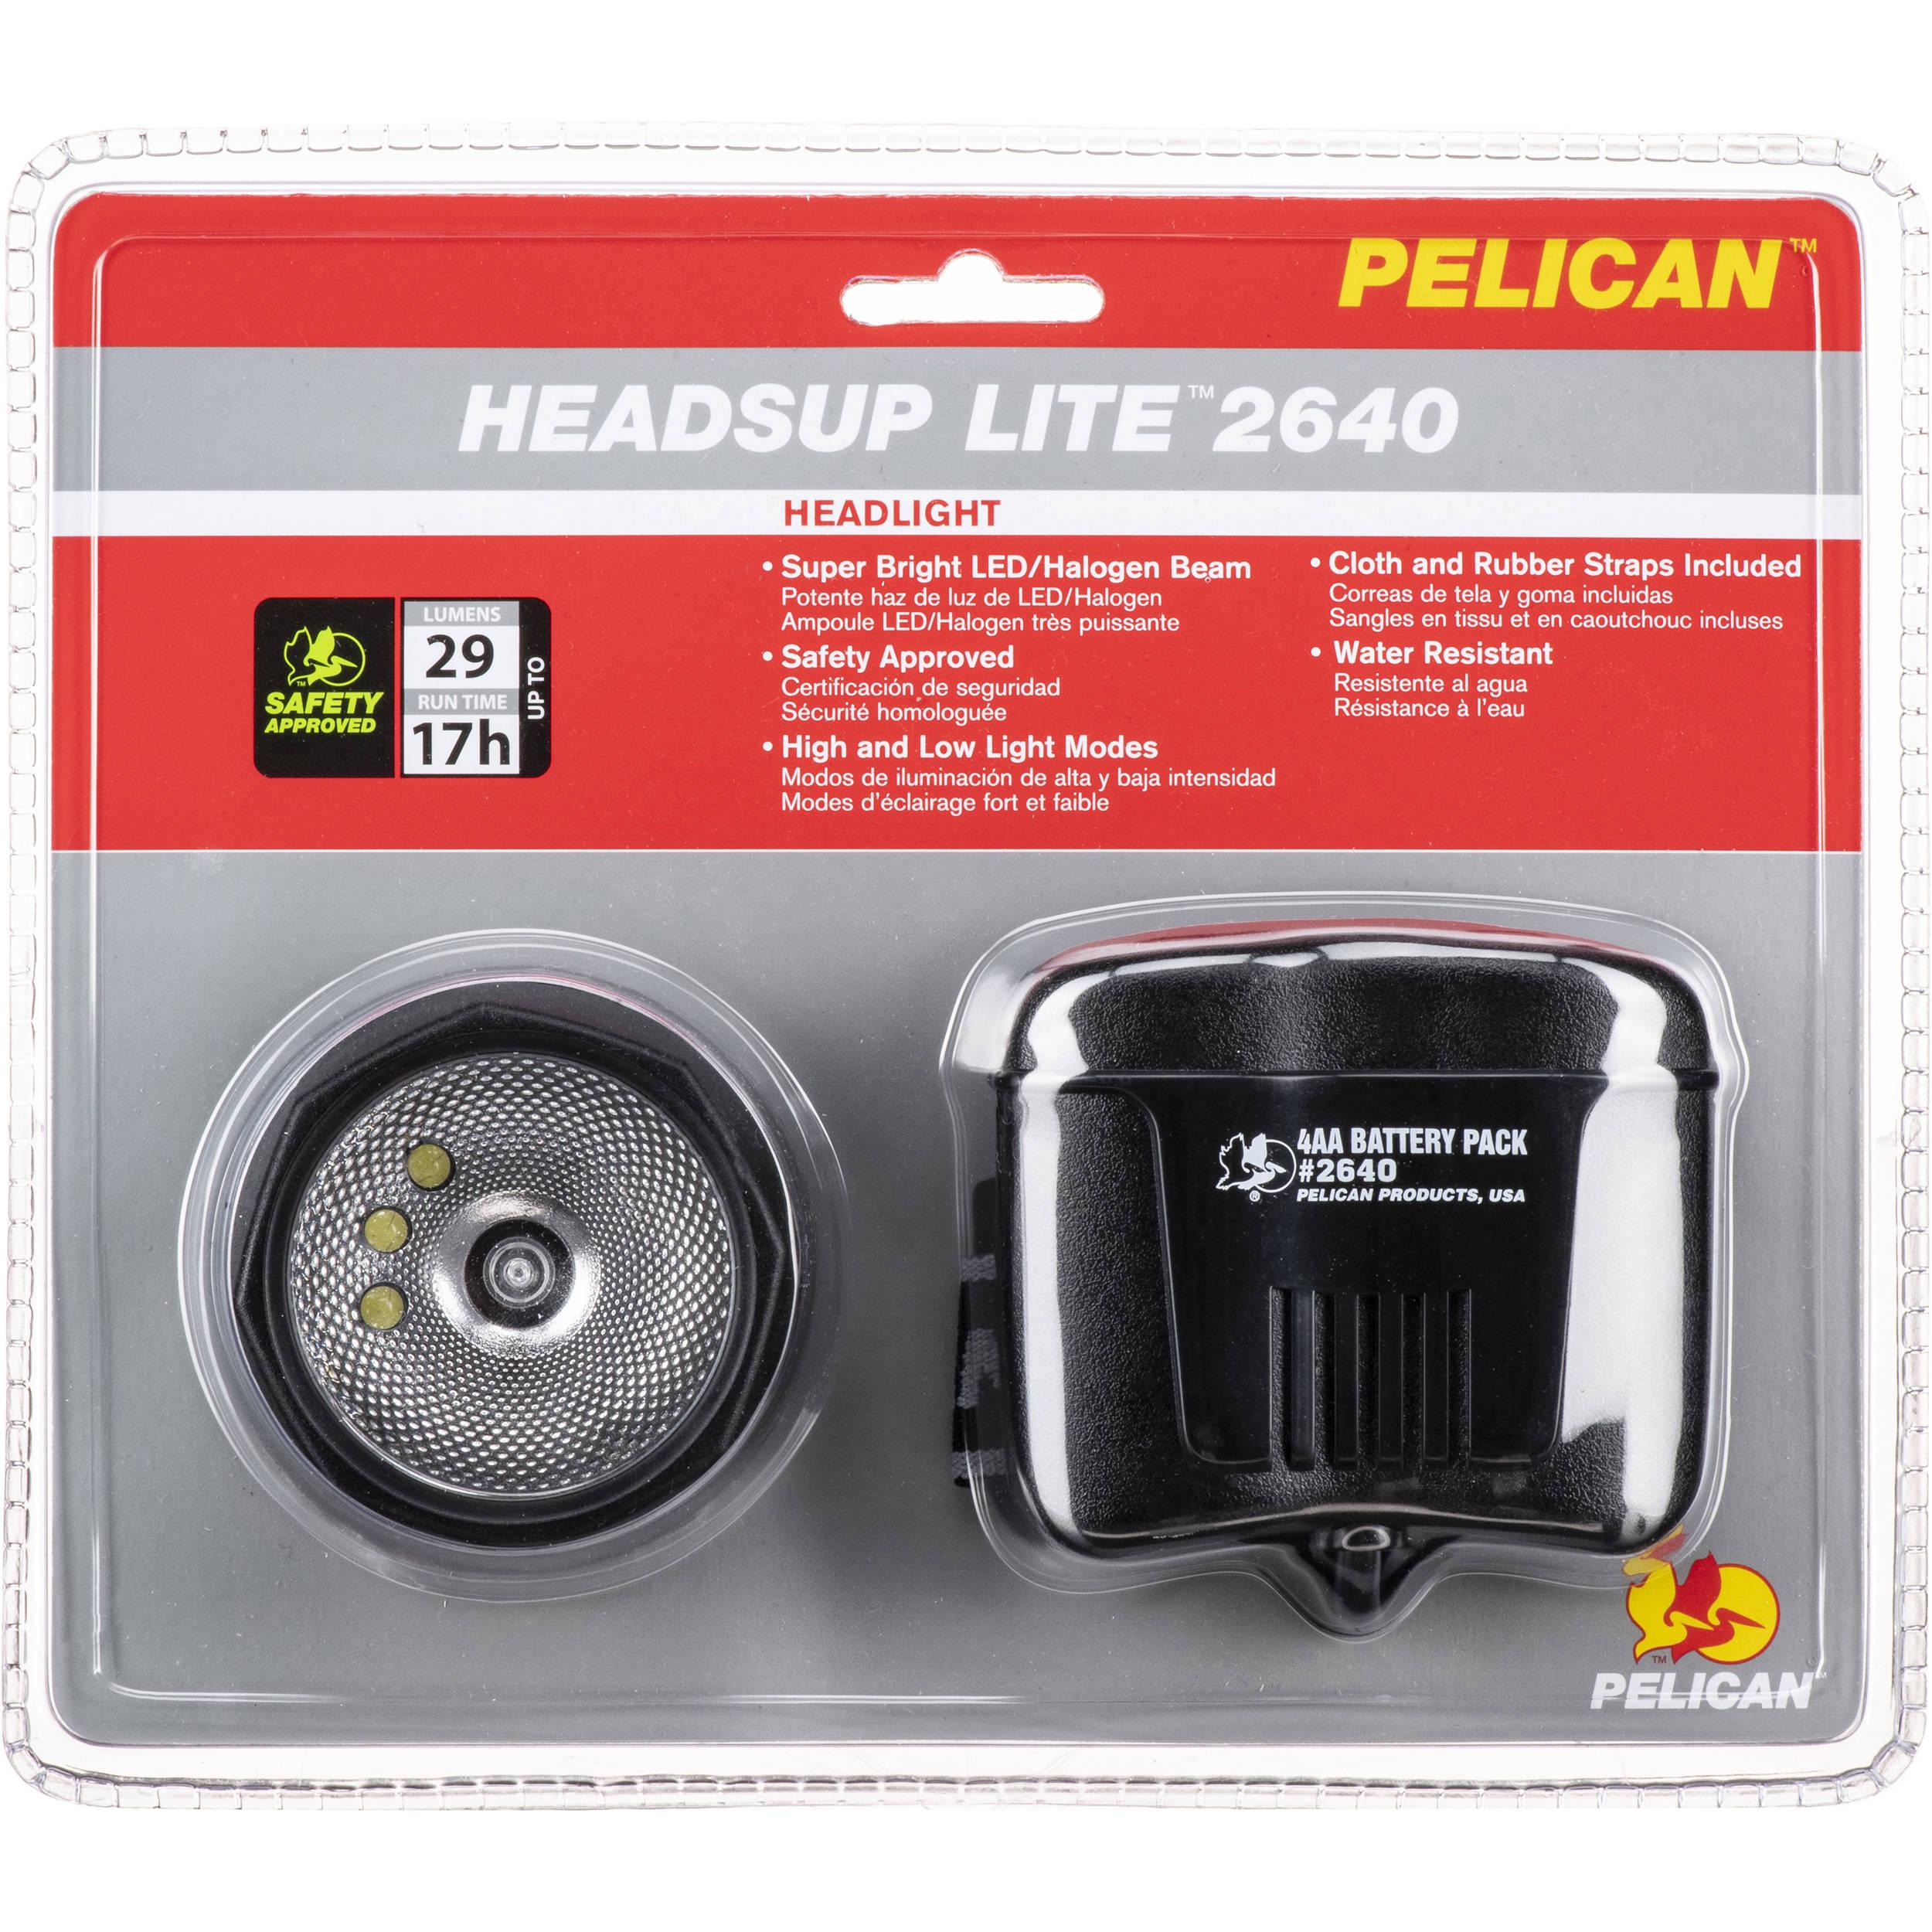 2640cb Up Headlamp Pelican Heads WDIEHY29